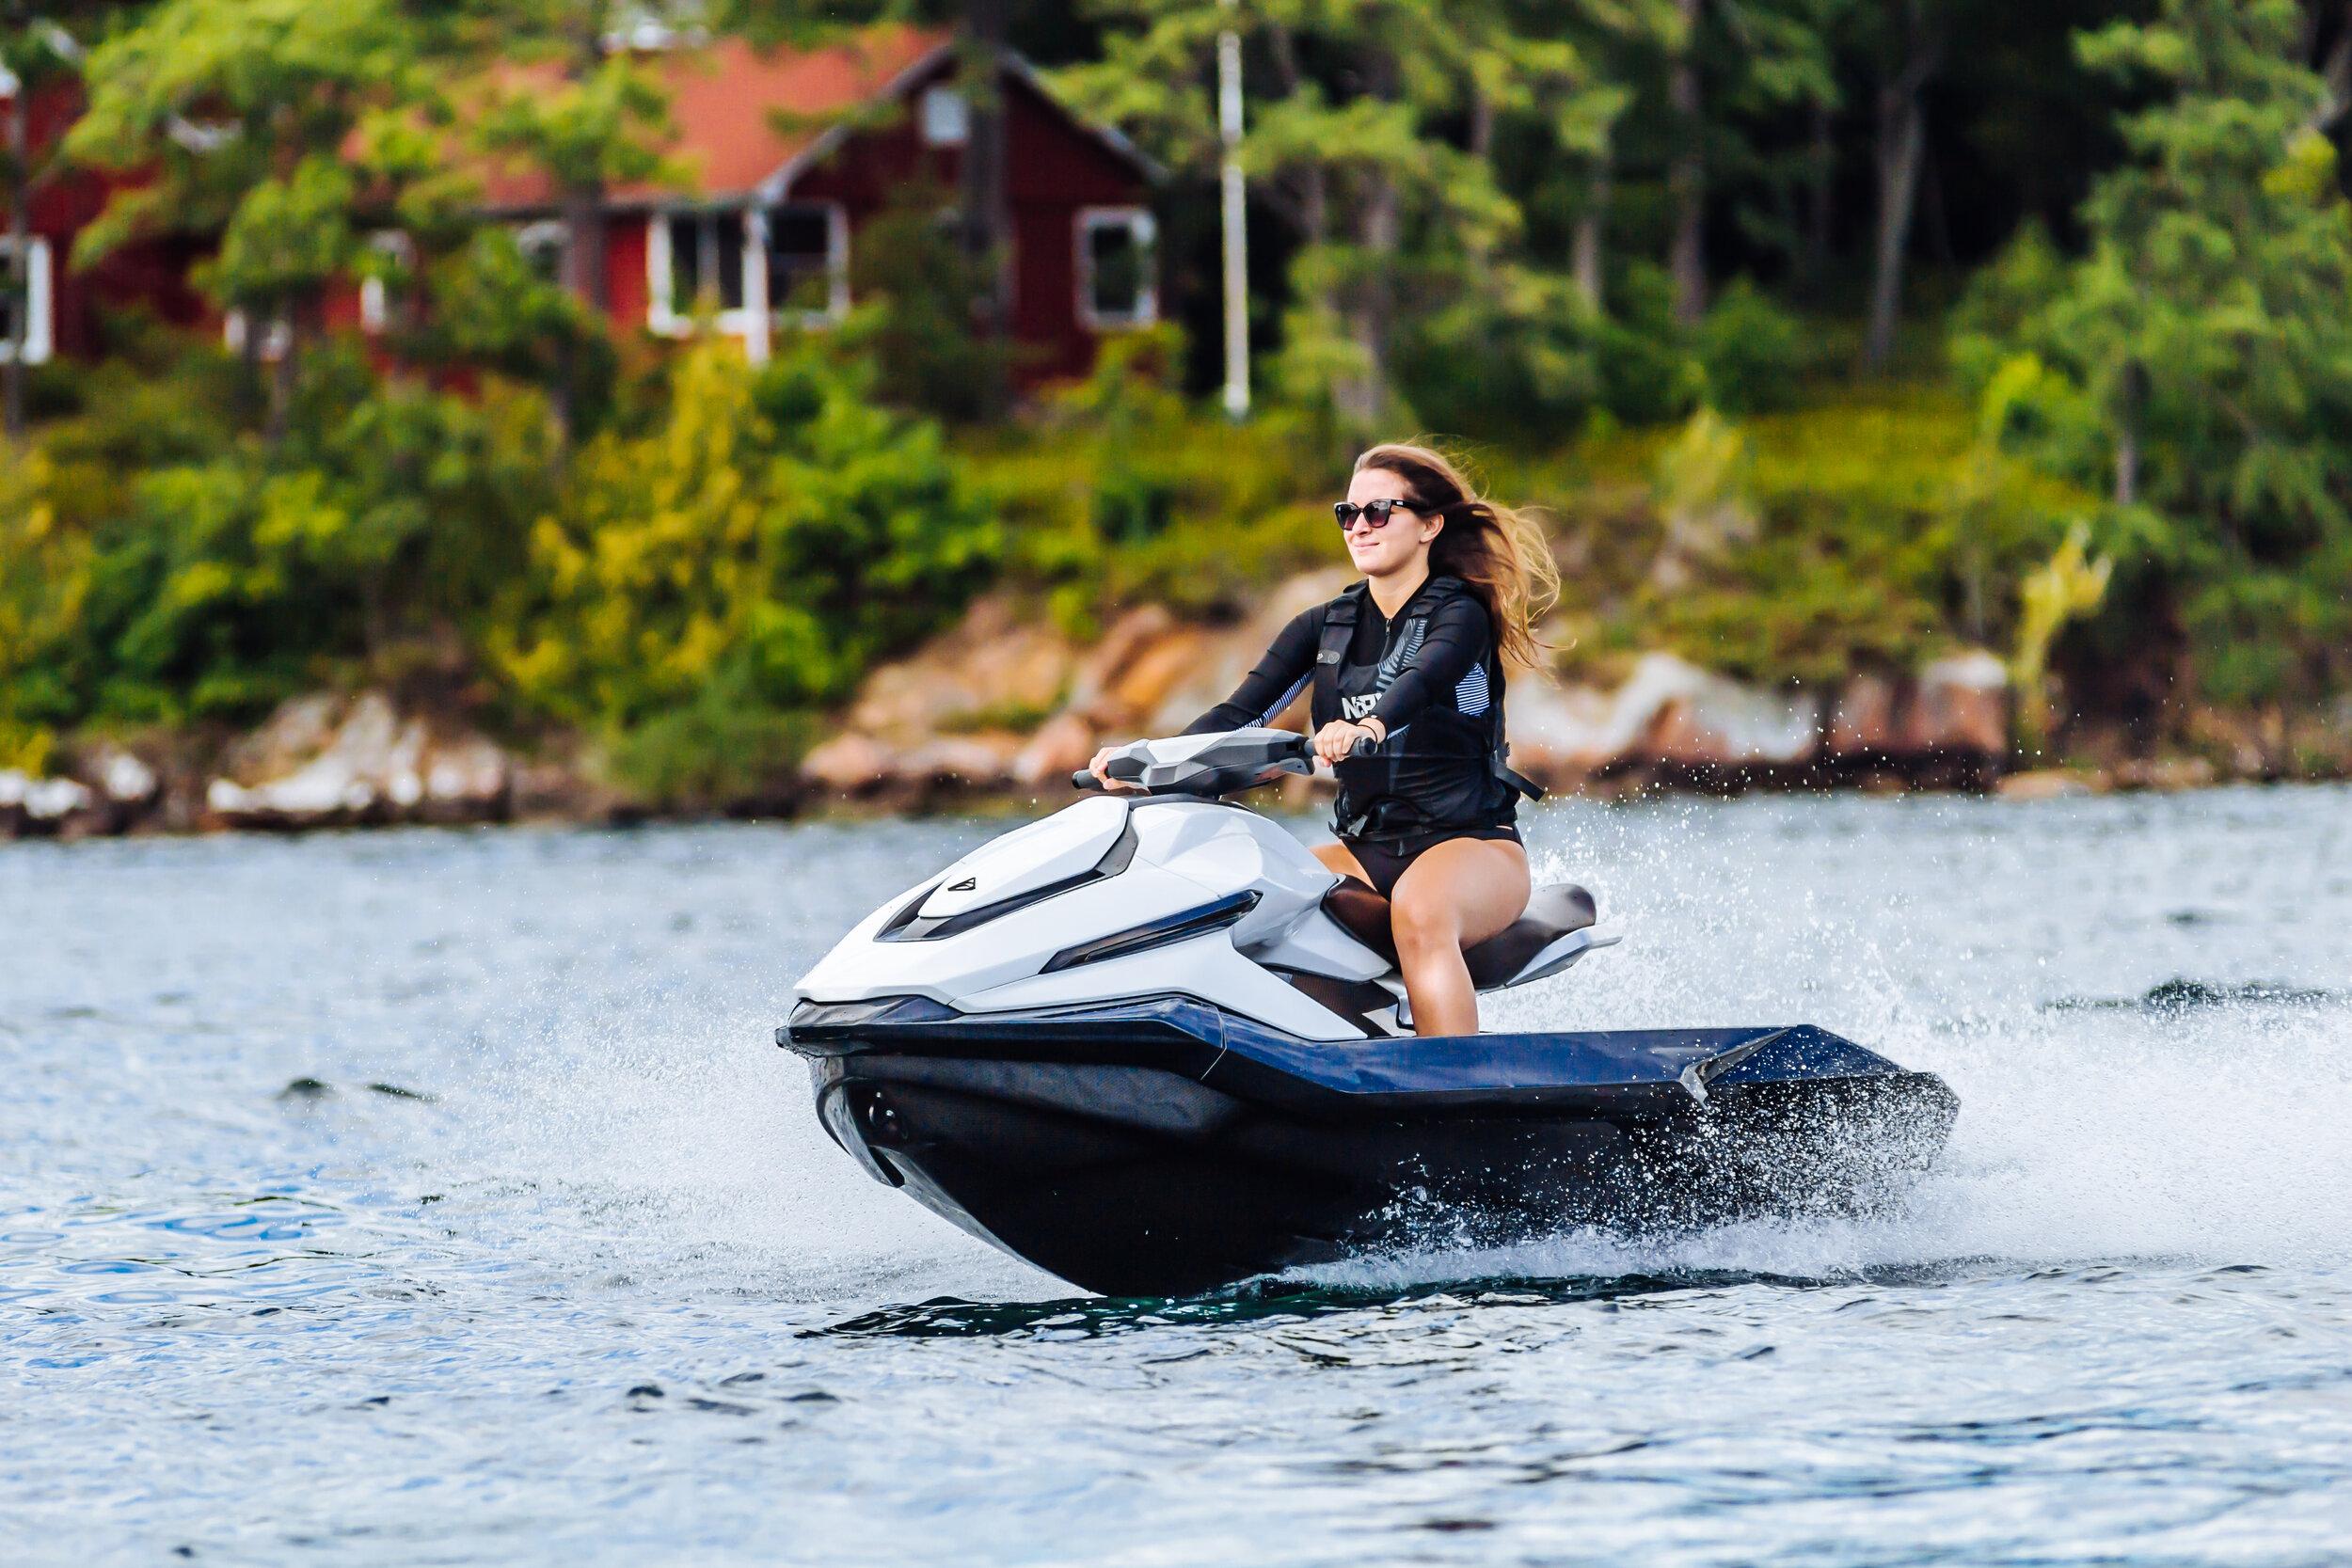 RYA Personal Watercraft Jetski